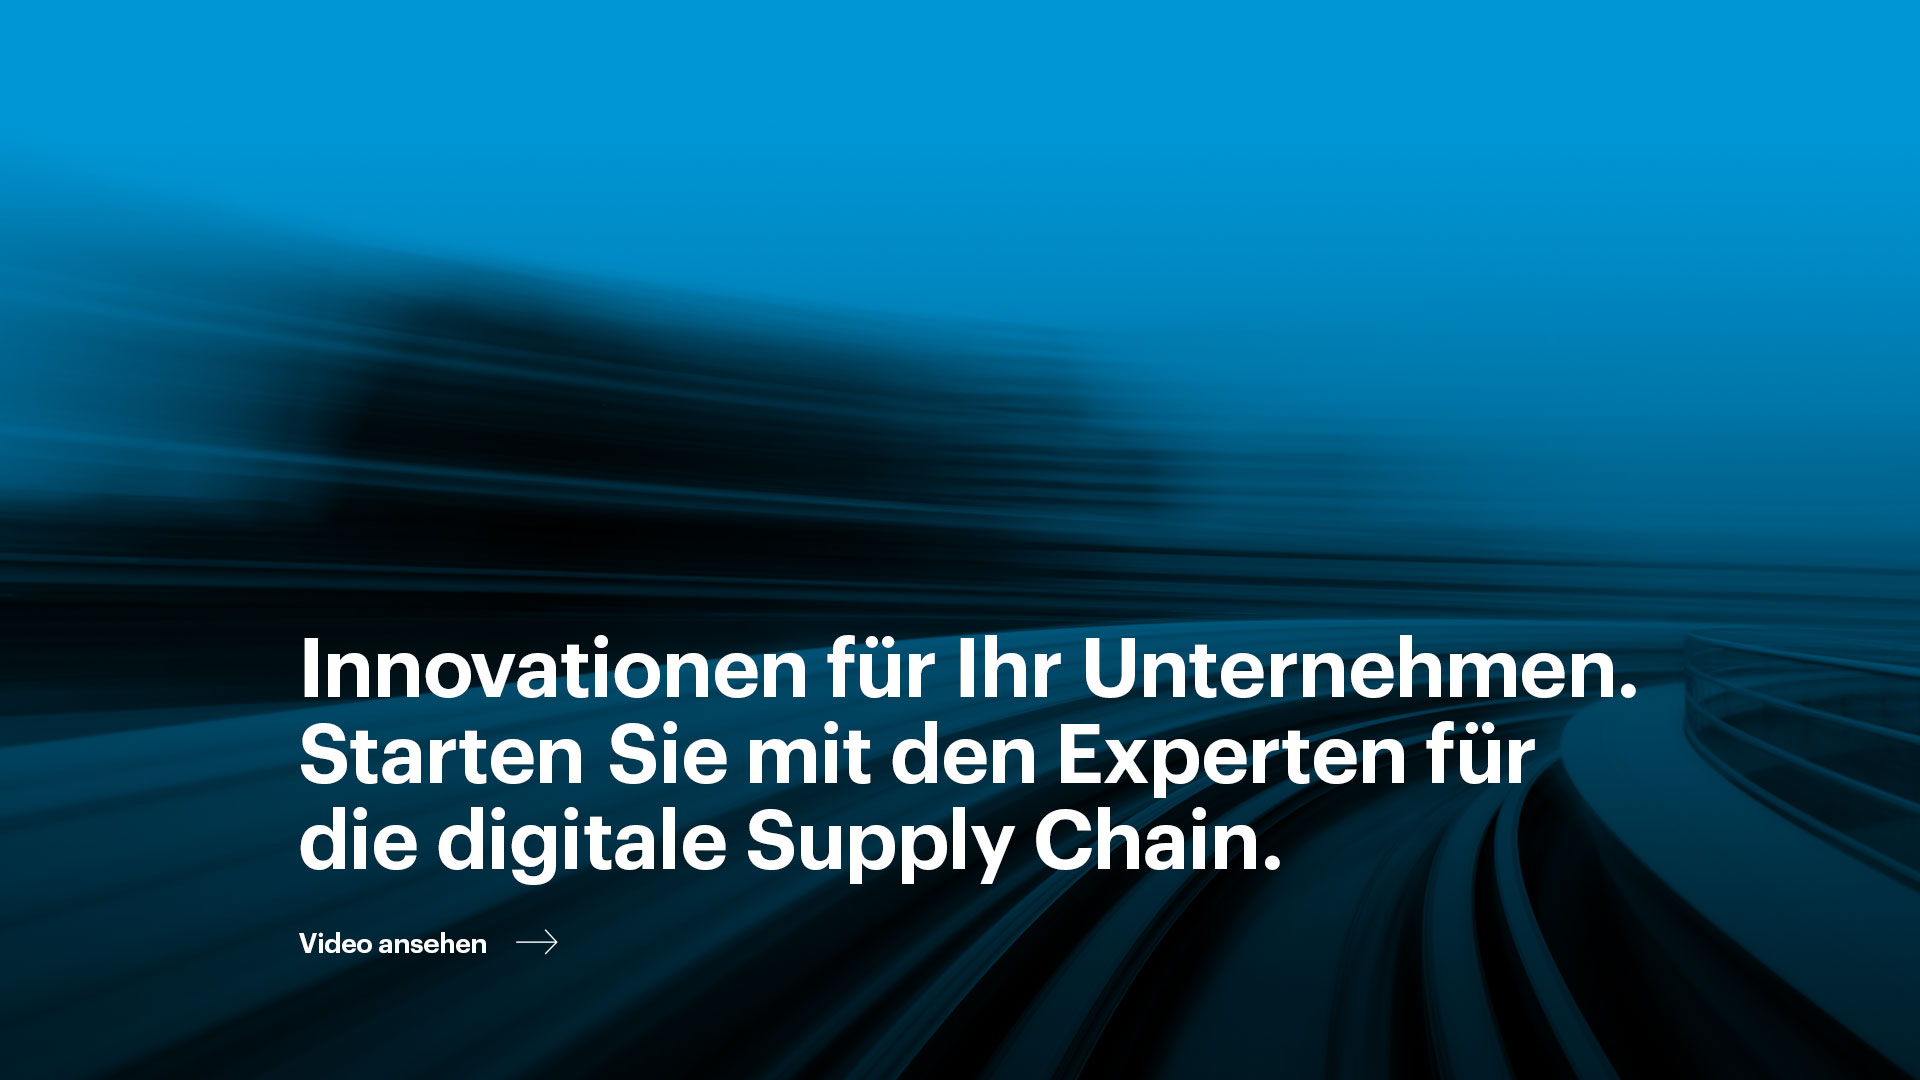 Innovate-business-digital-supply-chain-expert-DE